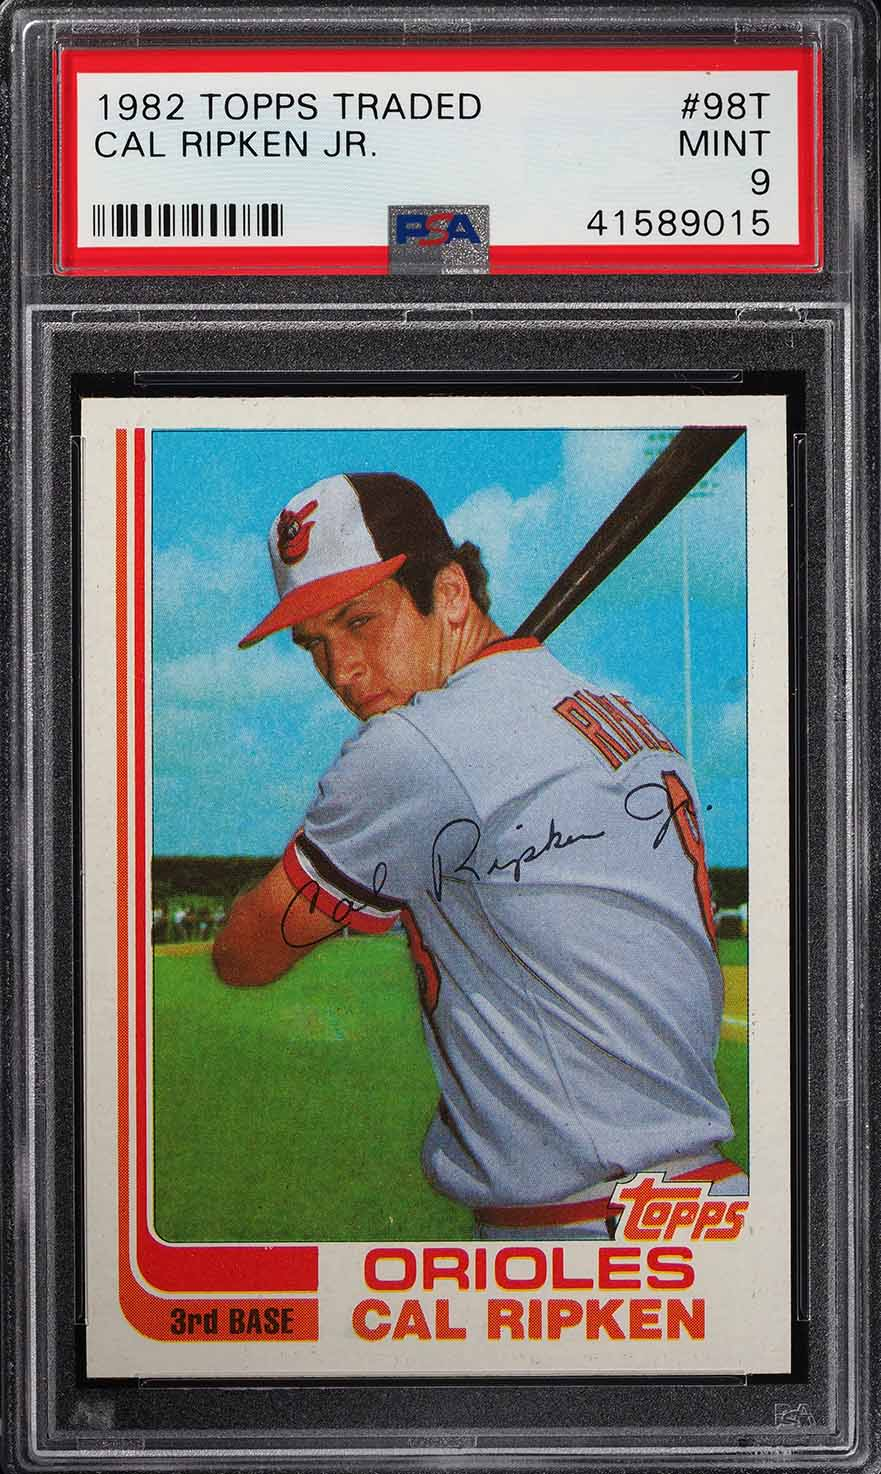 Image of: 1982 Topps Traded Cal Ripken Jr. ROOKIE RC #98T PSA 9 MINT (PWCC)